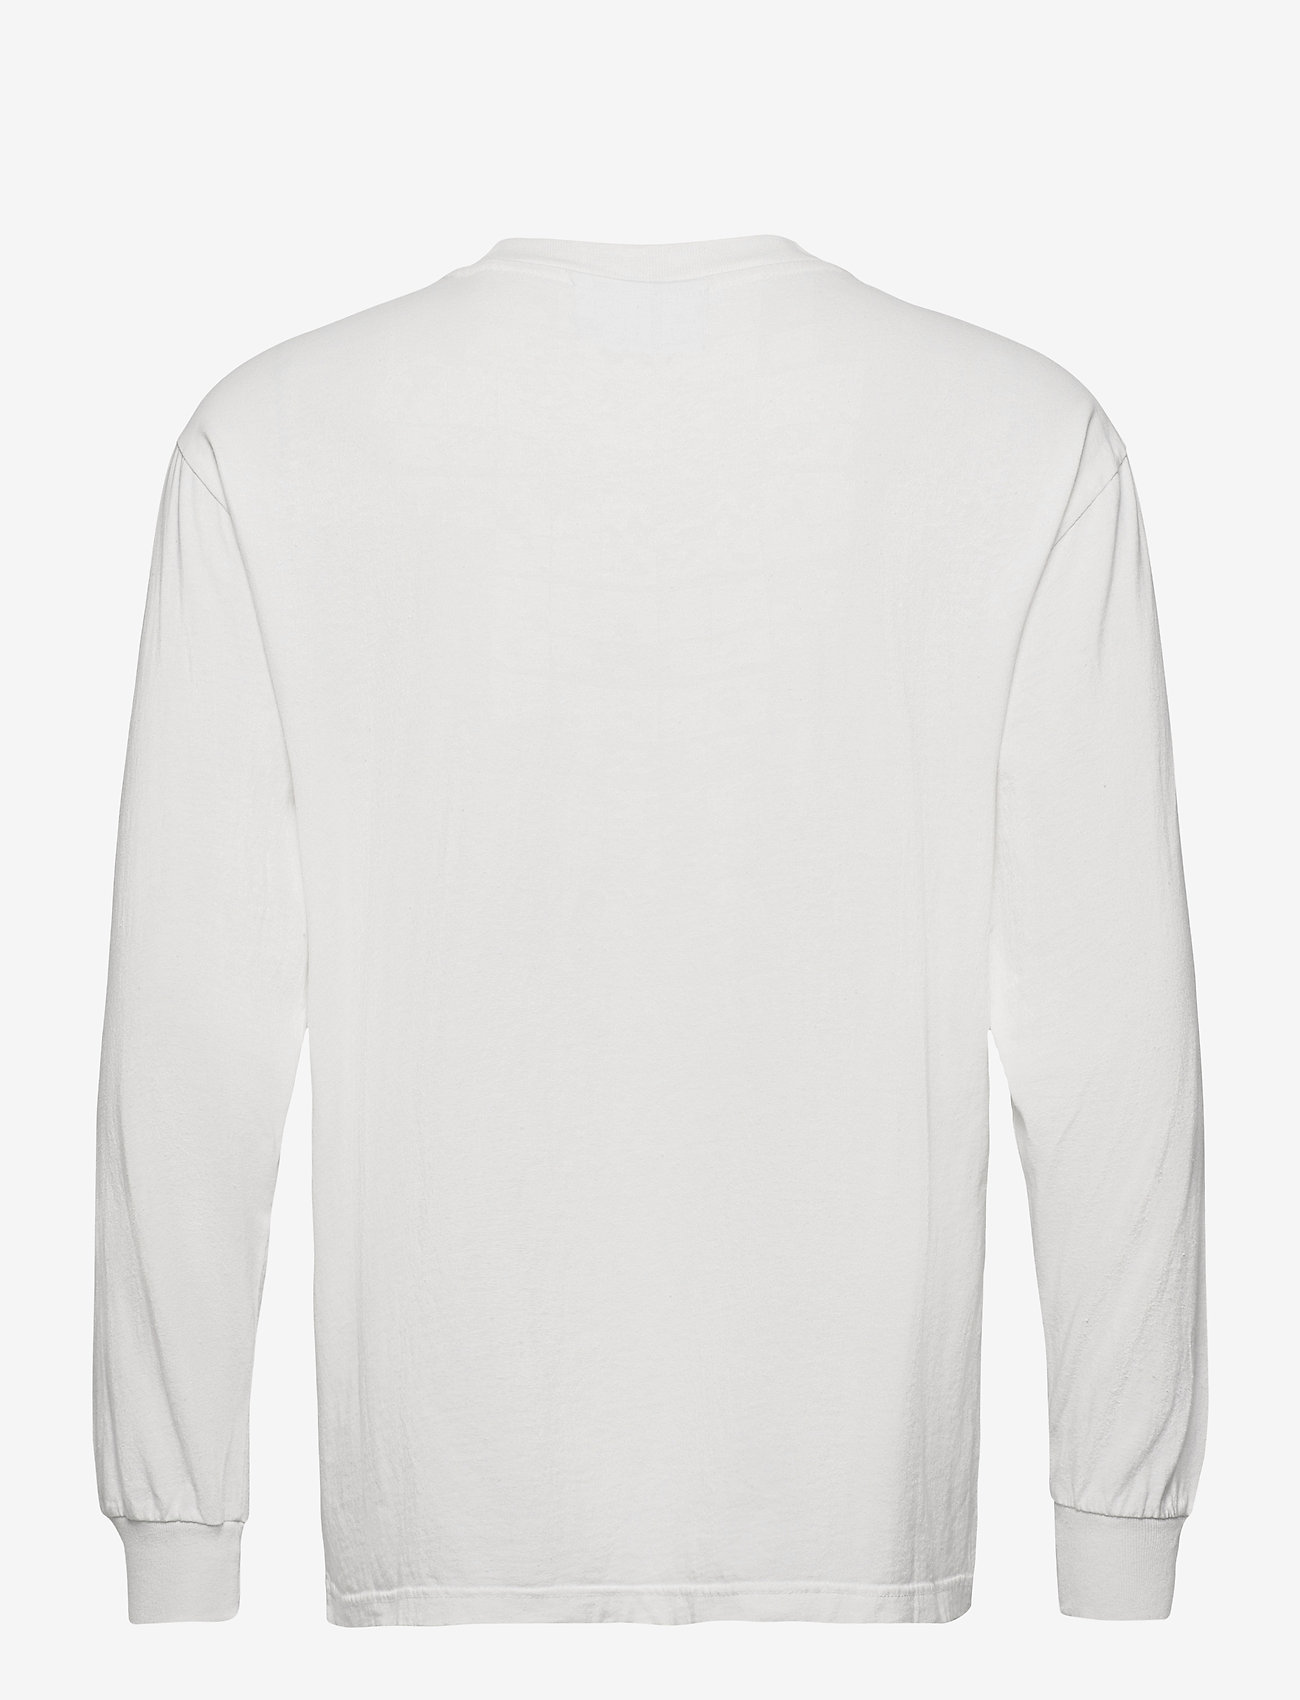 HAN Kjøbenhavn - Boxy Long Sleeve Tee - lange mouwen - off white - 1